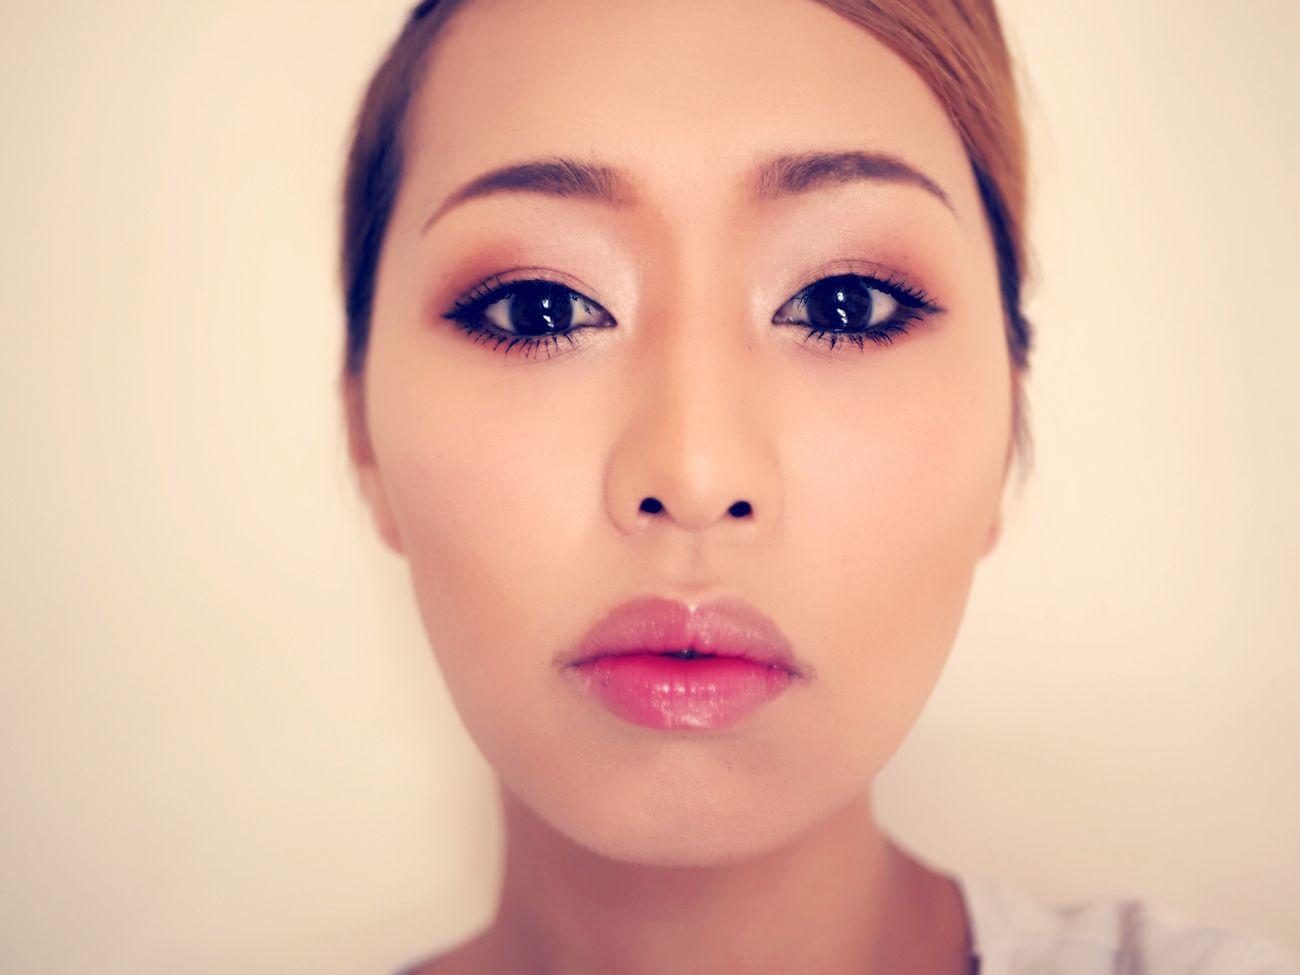 Makeup by me Beauty Looking At Camera Make-up Make-up Makeup Makeupartist Photo Makeuplovers Makeupbyme Orange Japanese